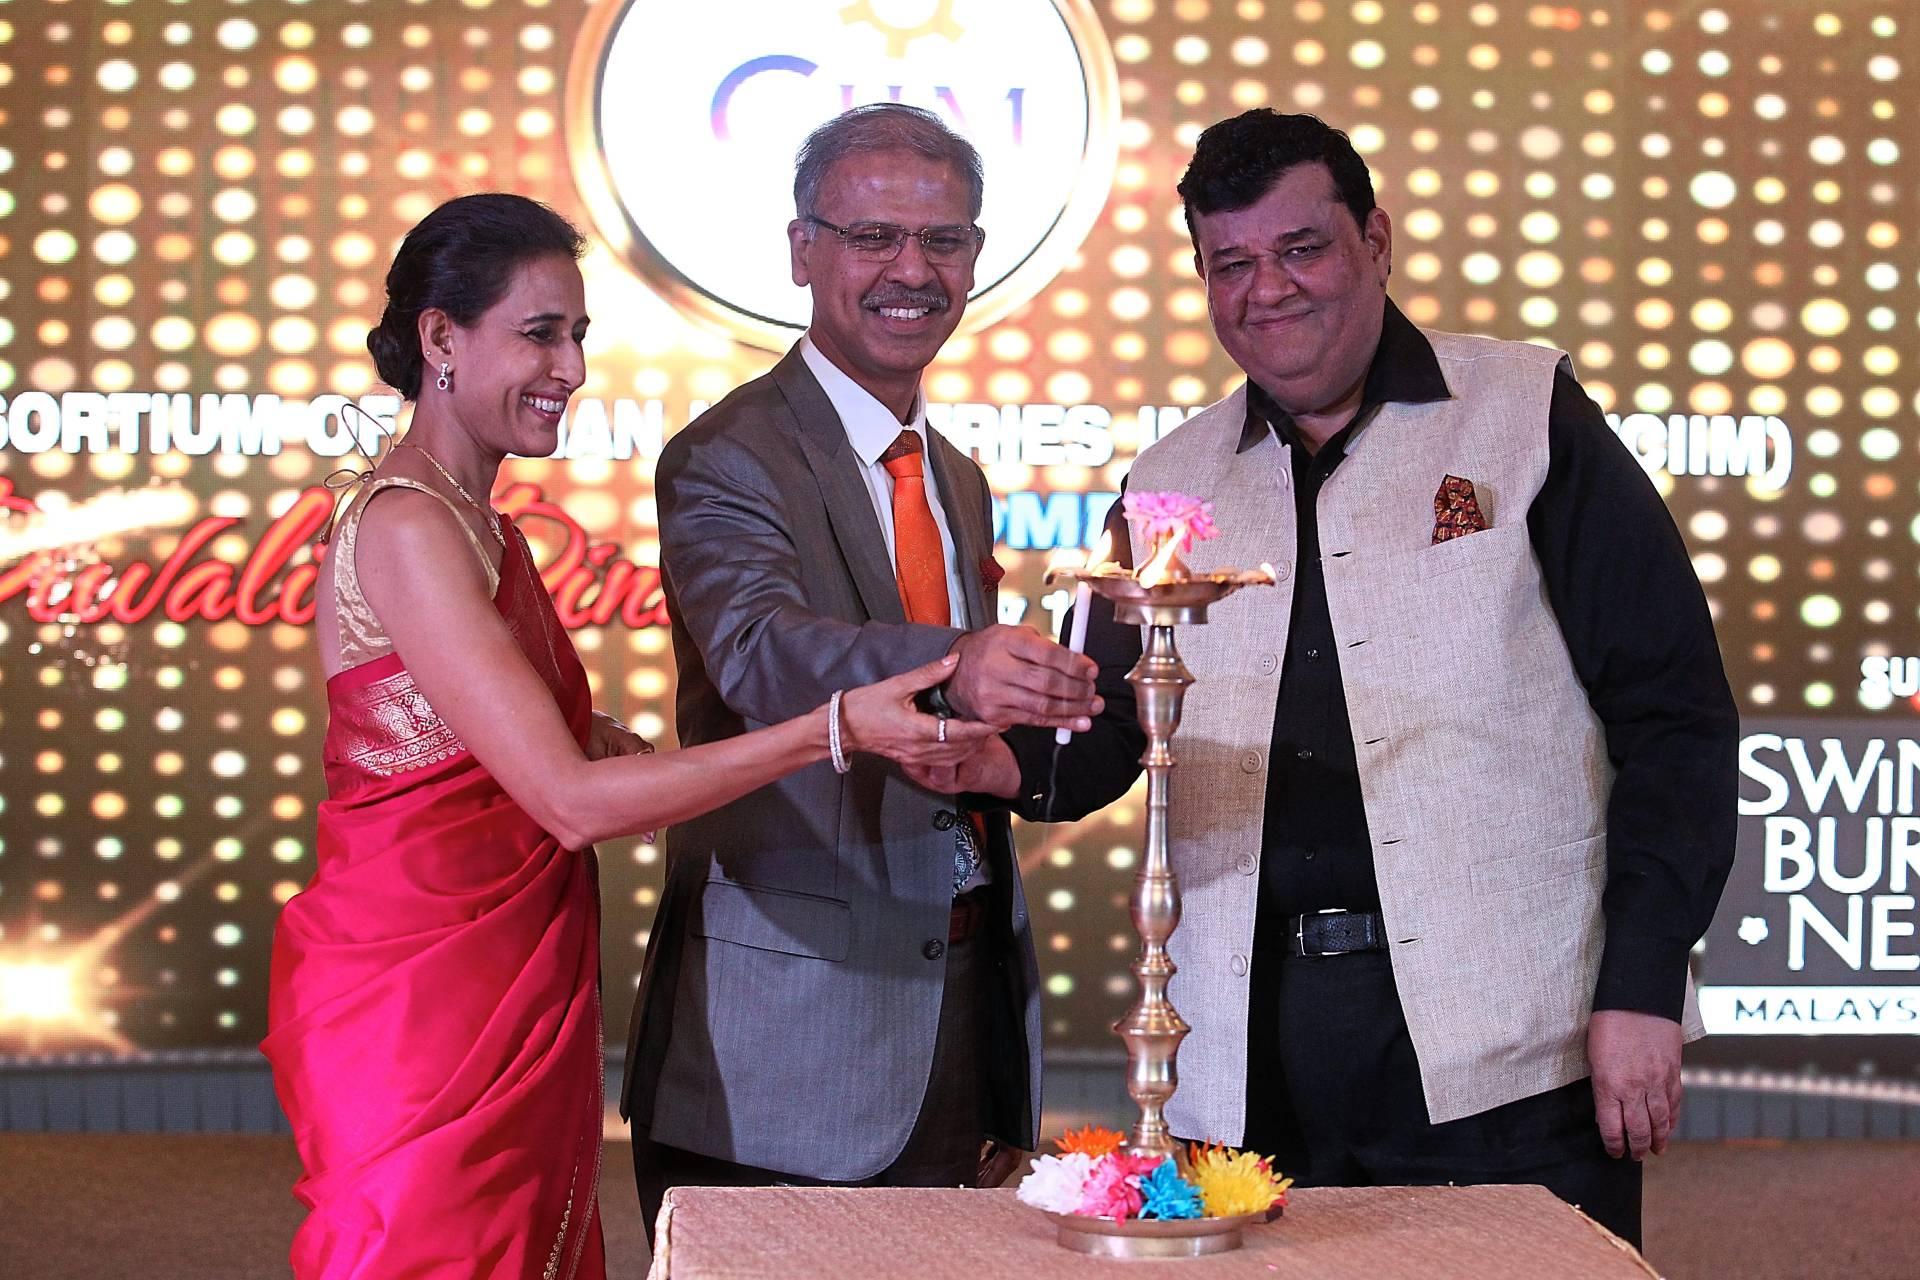 Indian merchants network at festive get-together